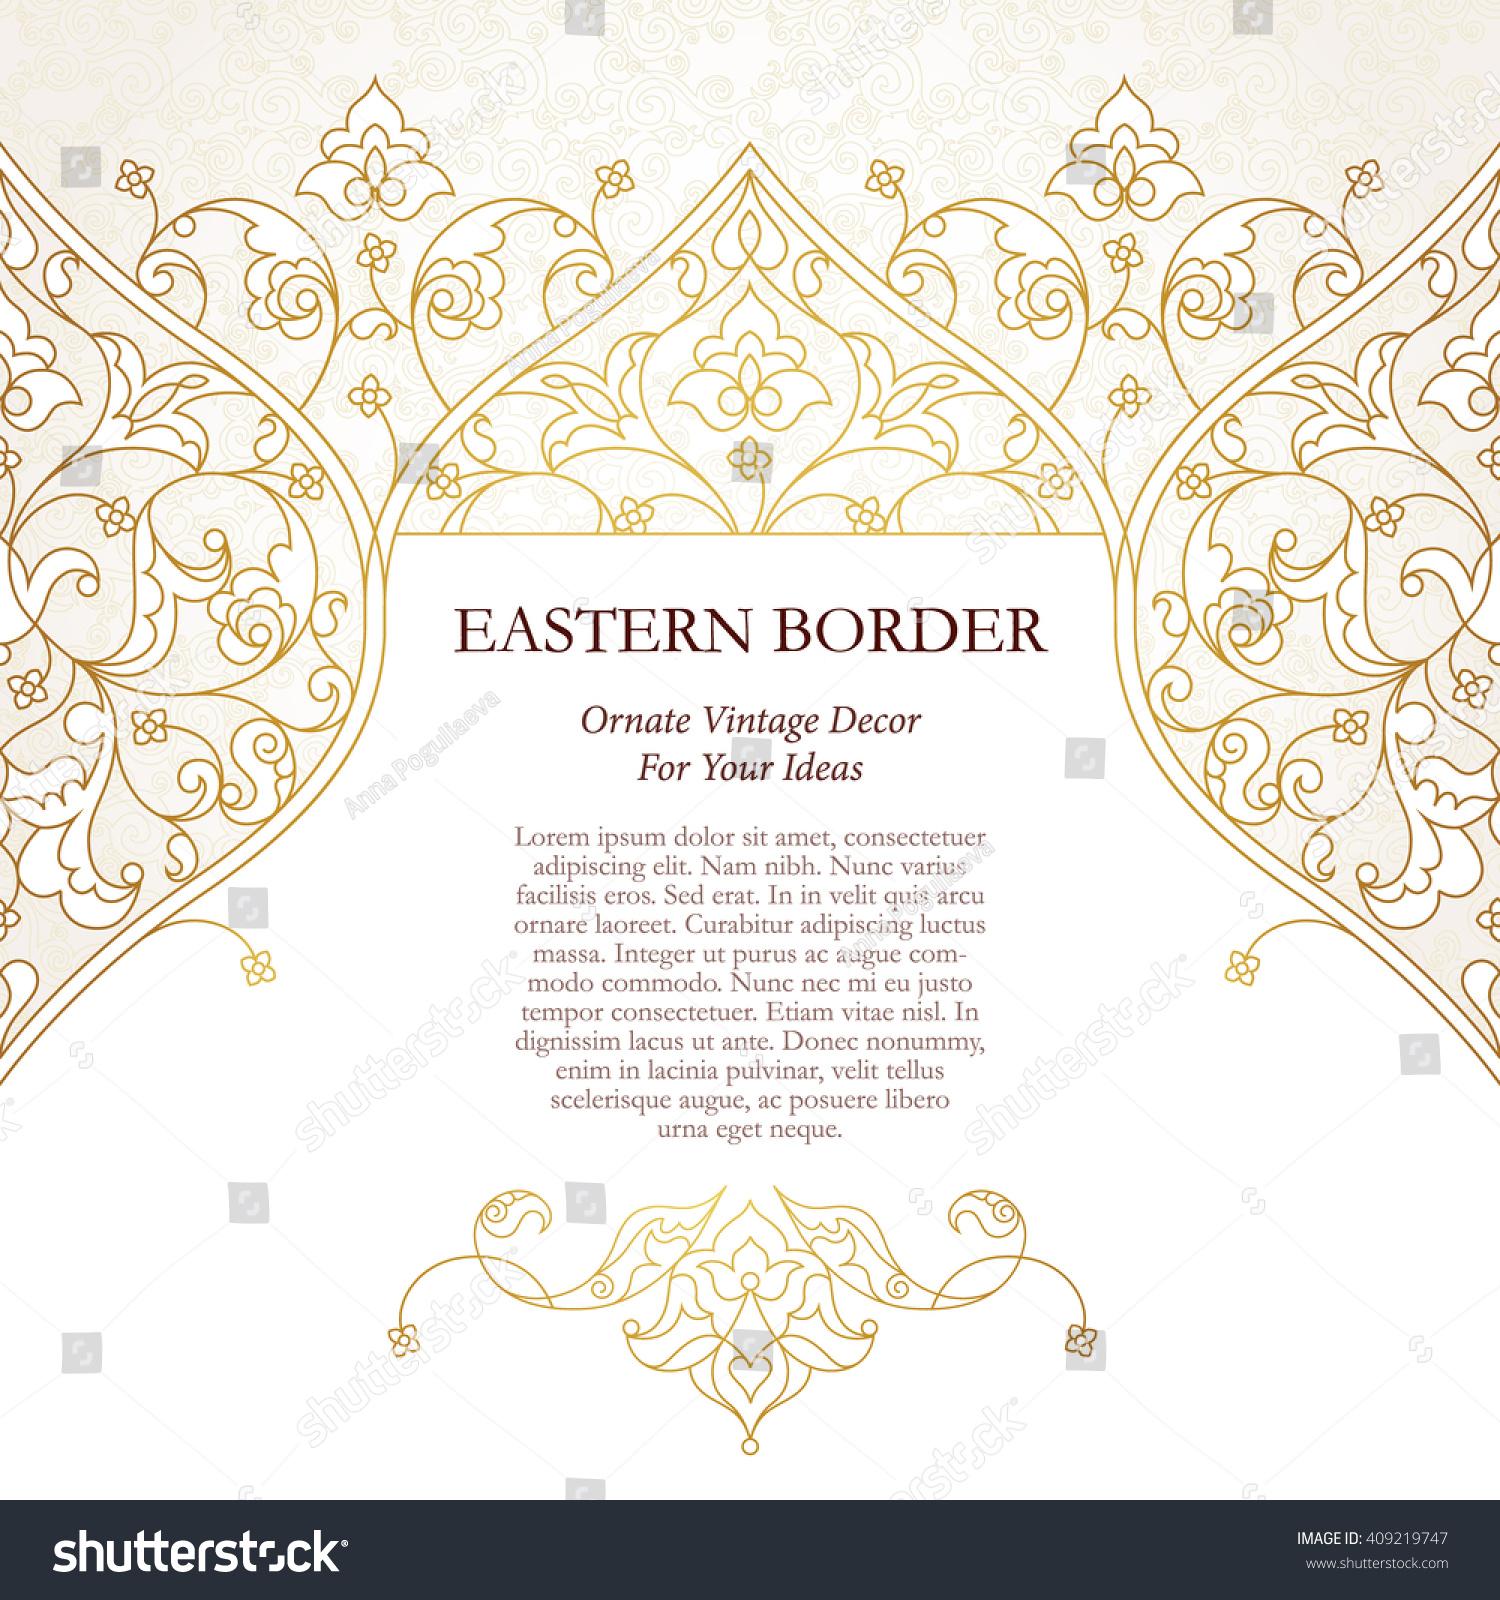 Border Design Template Vosvetenet – Paper Border Designs Templates